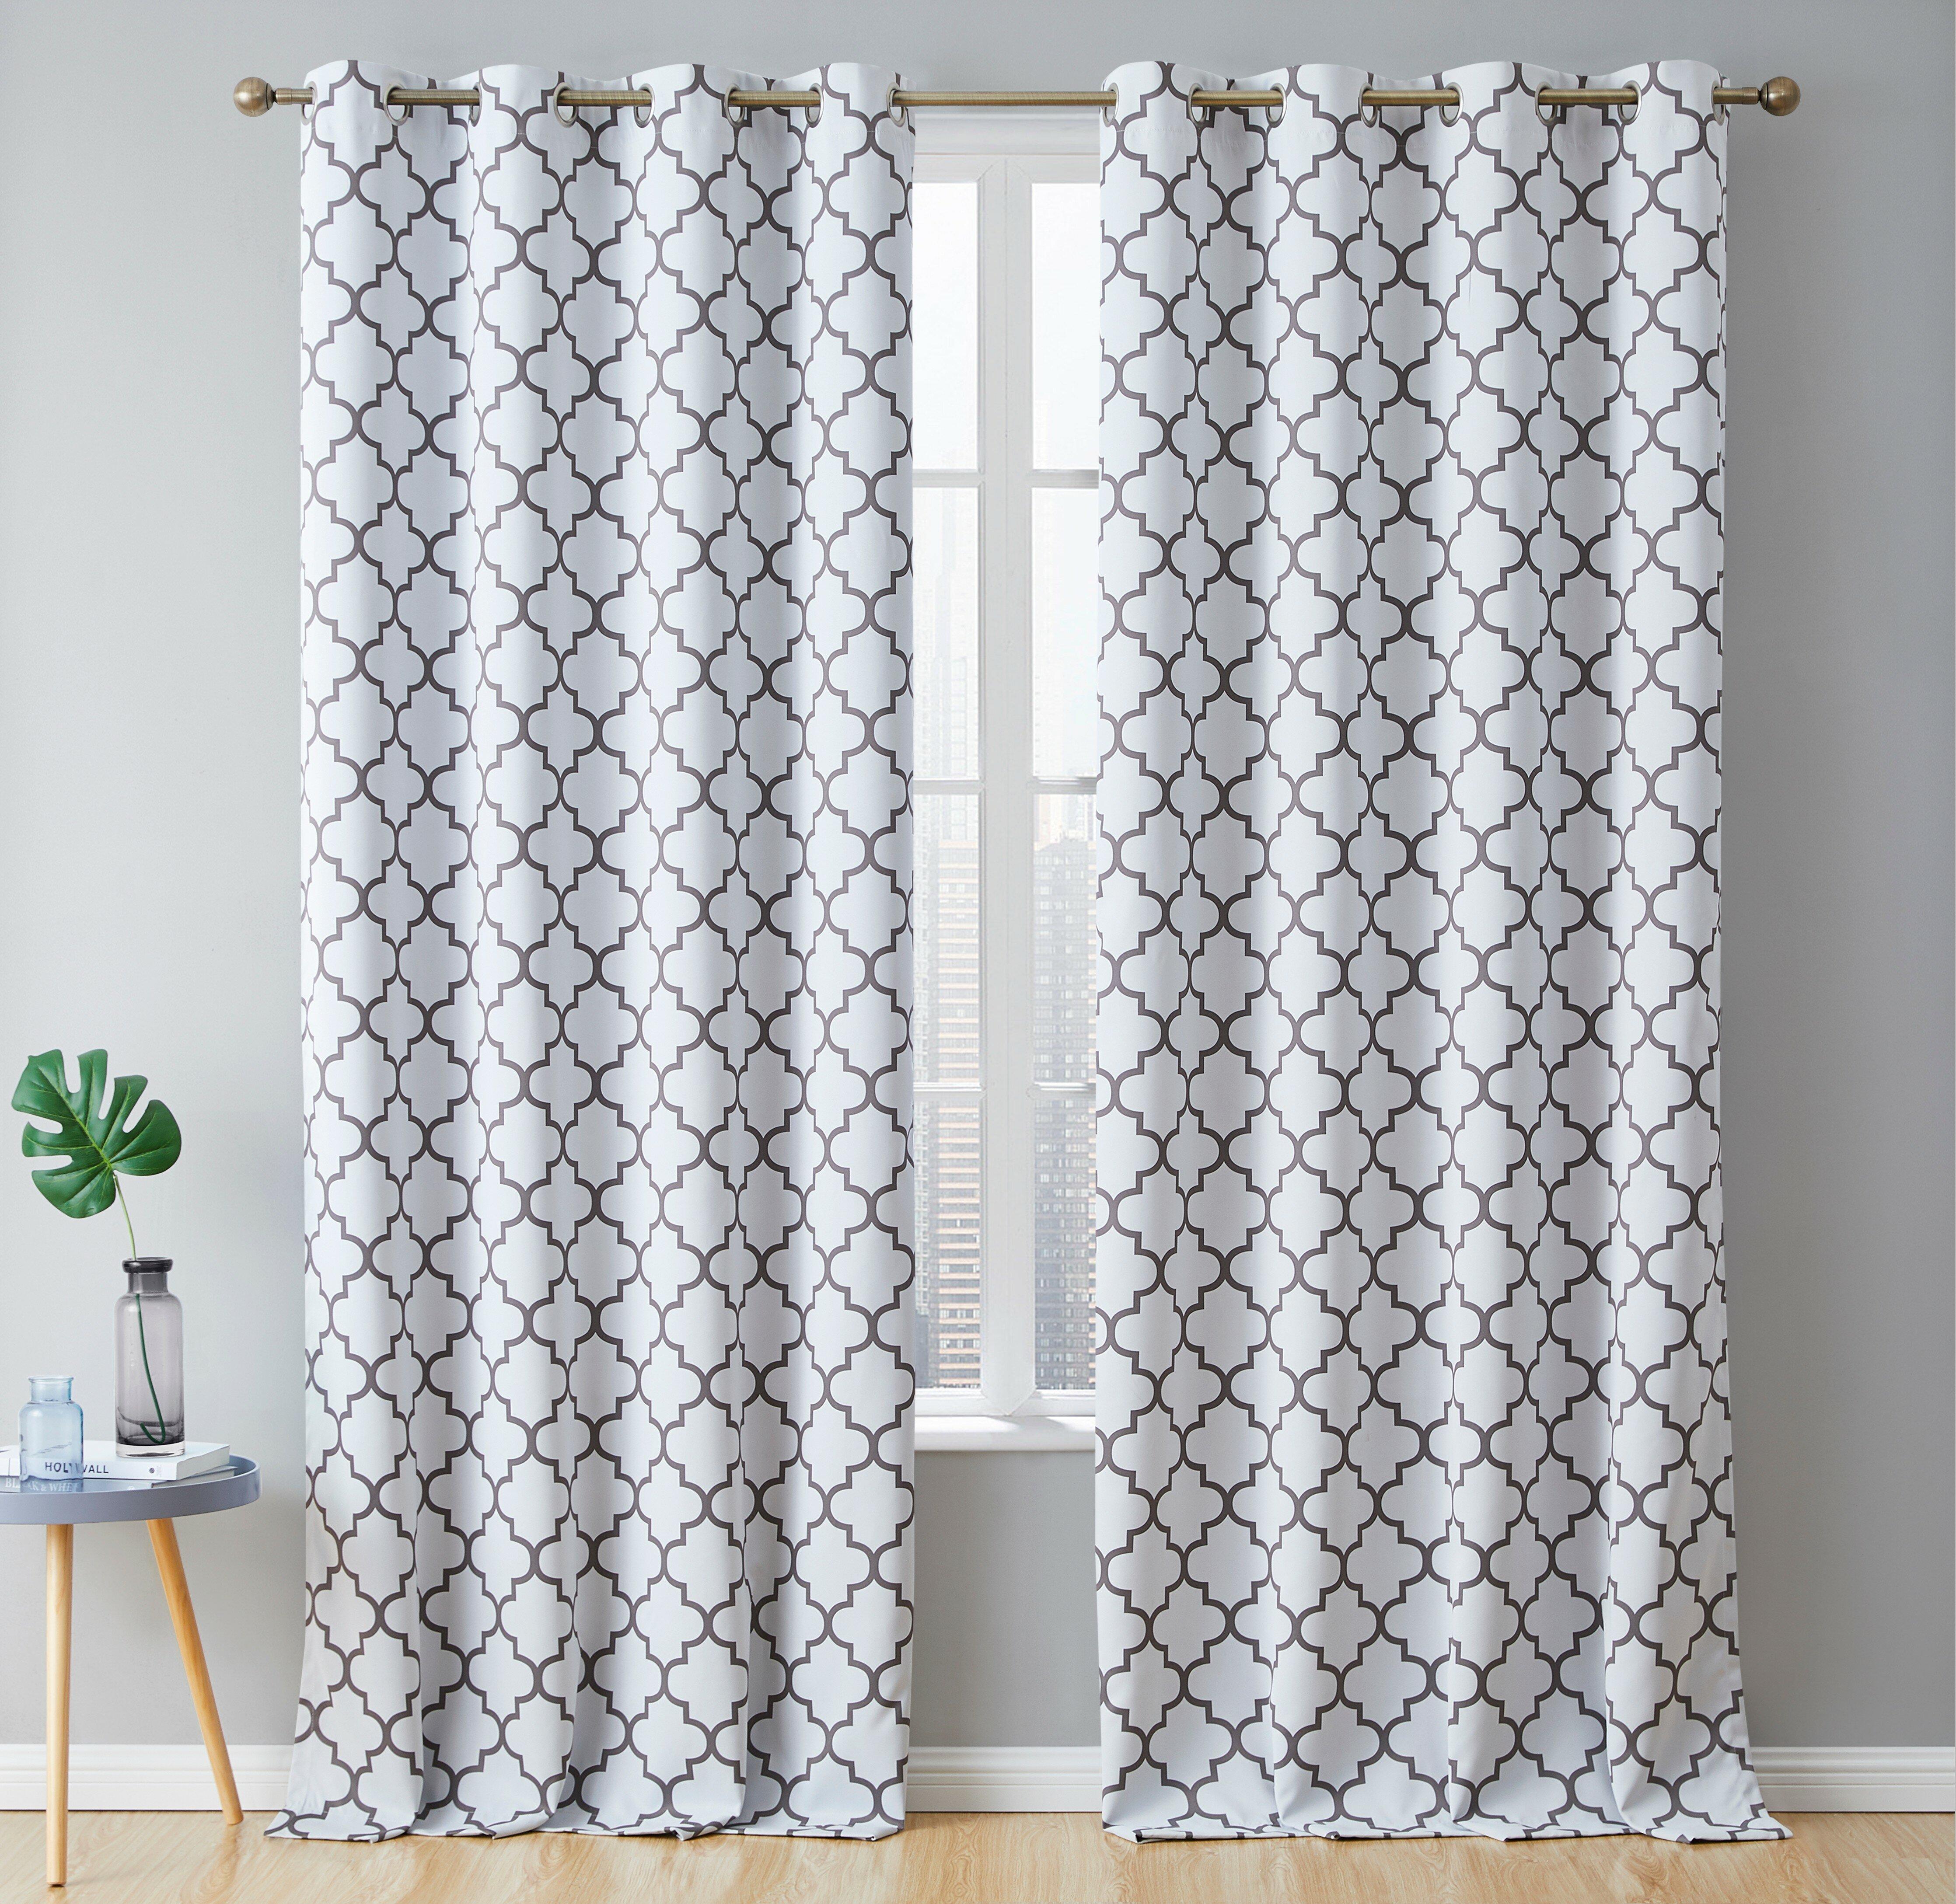 Andover Mills Temescal Lattice Geometric Blackout Thermal Grommet Curtain Panels Reviews Wayfair